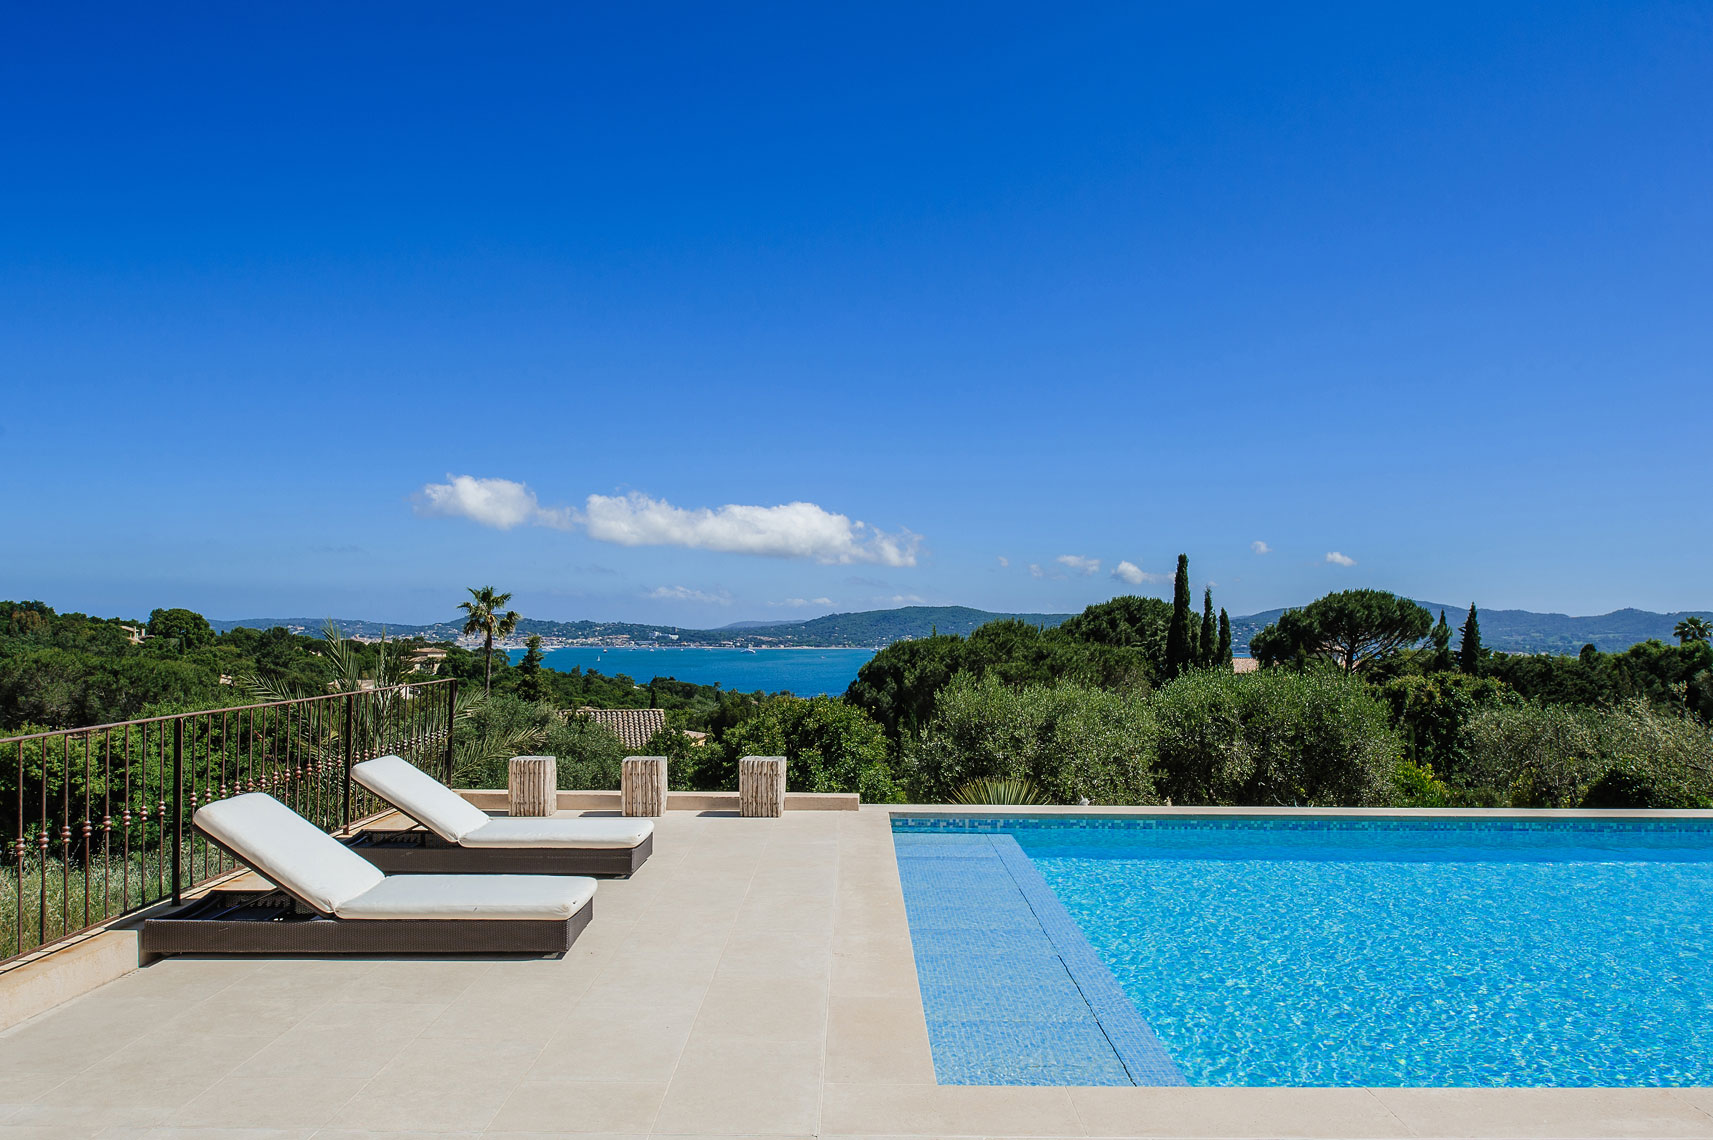 Villa-Turquoise---Victor-Perez-Architectural-Photographer-08.jpg